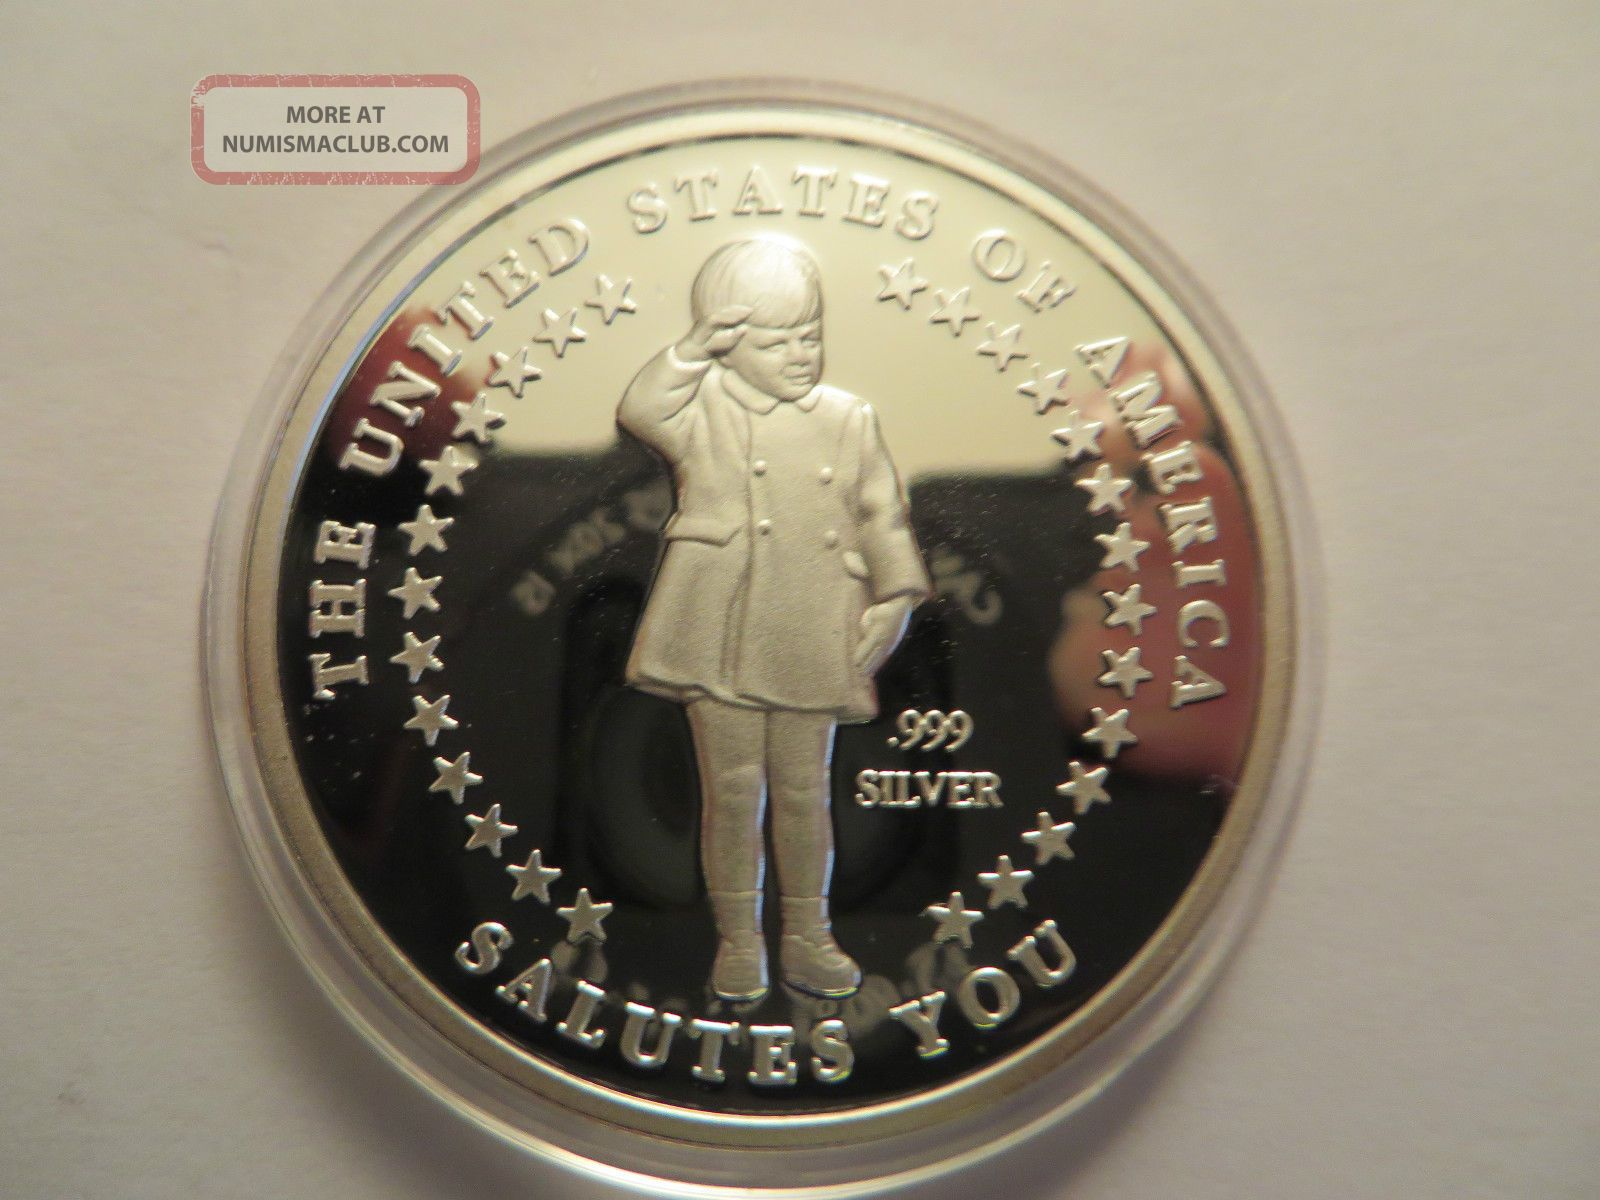 1 Oz Silver Art Round 999 Fine John F Kennedy Jr 1960 1999